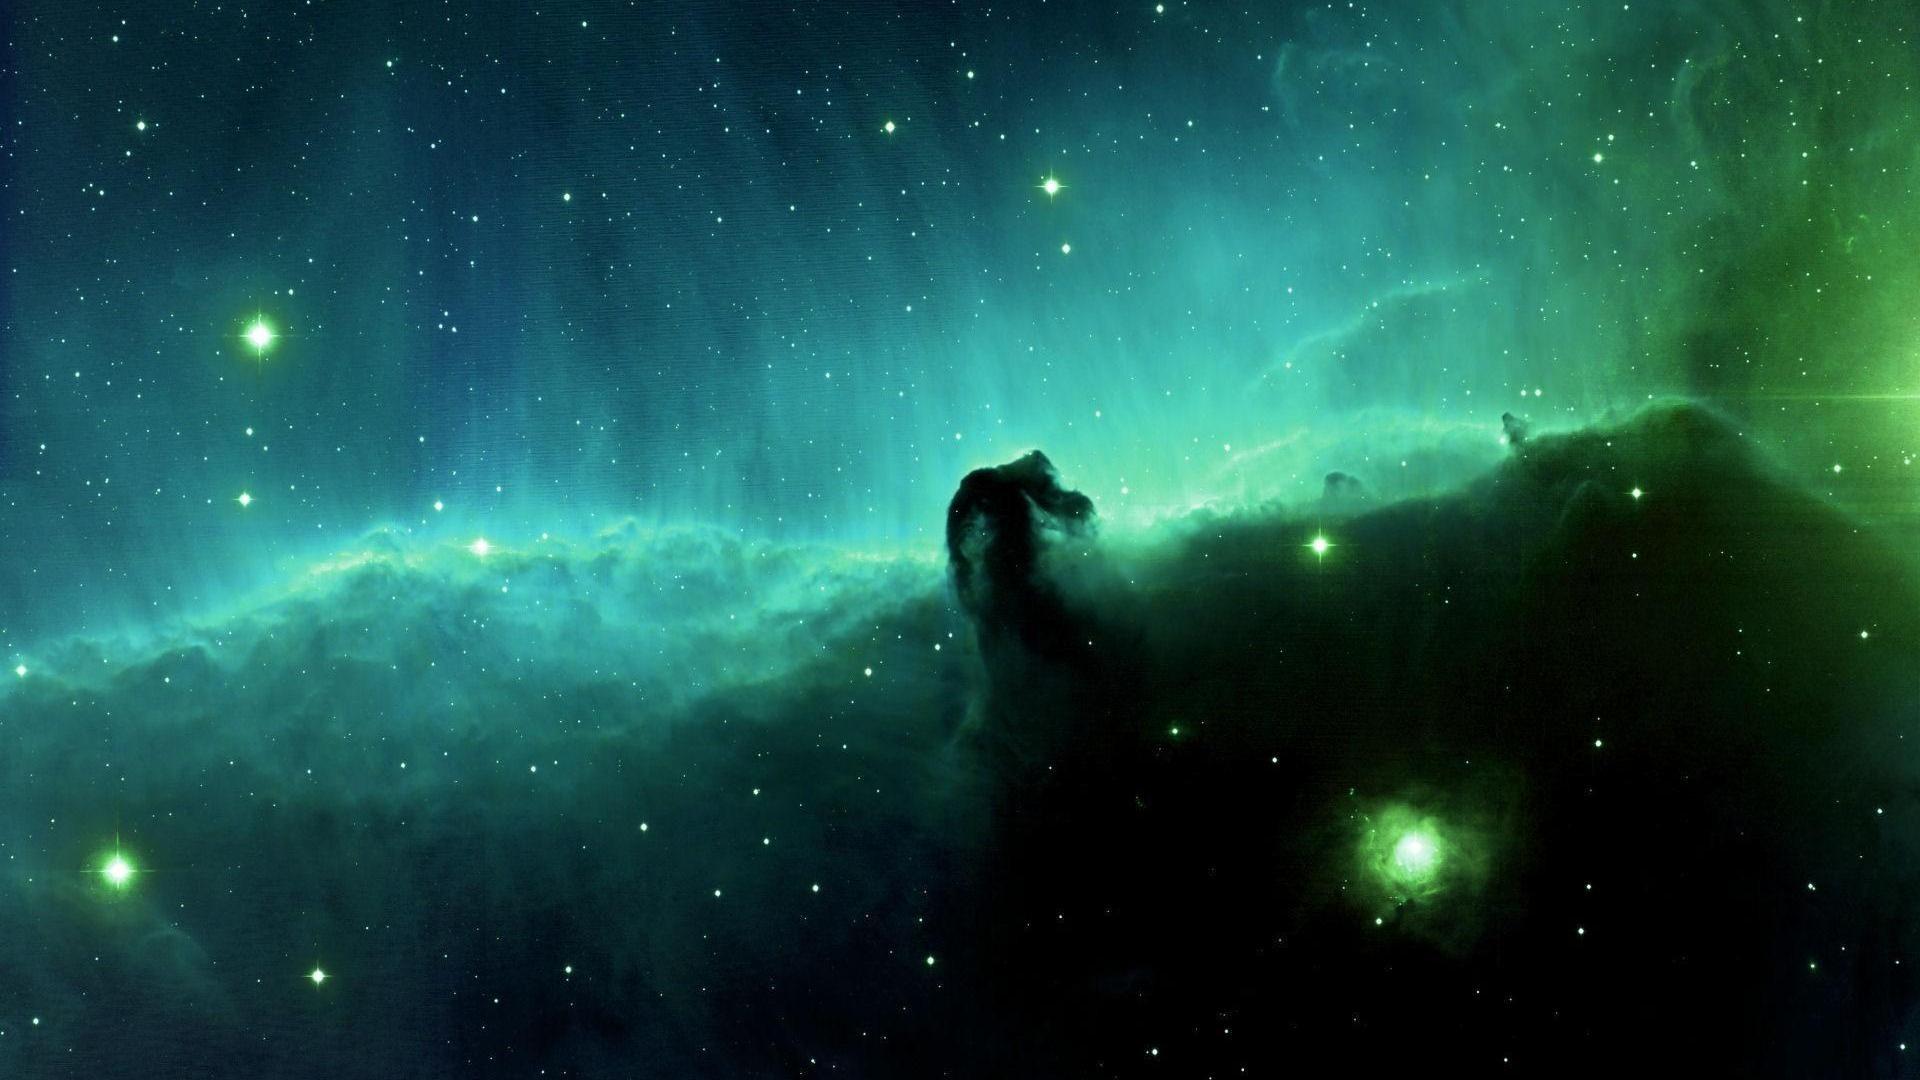 1920×1080-space_nebula_horsehead_nebula-12735.jpg (1920×1080) · Wallpaper  In HdNebula …